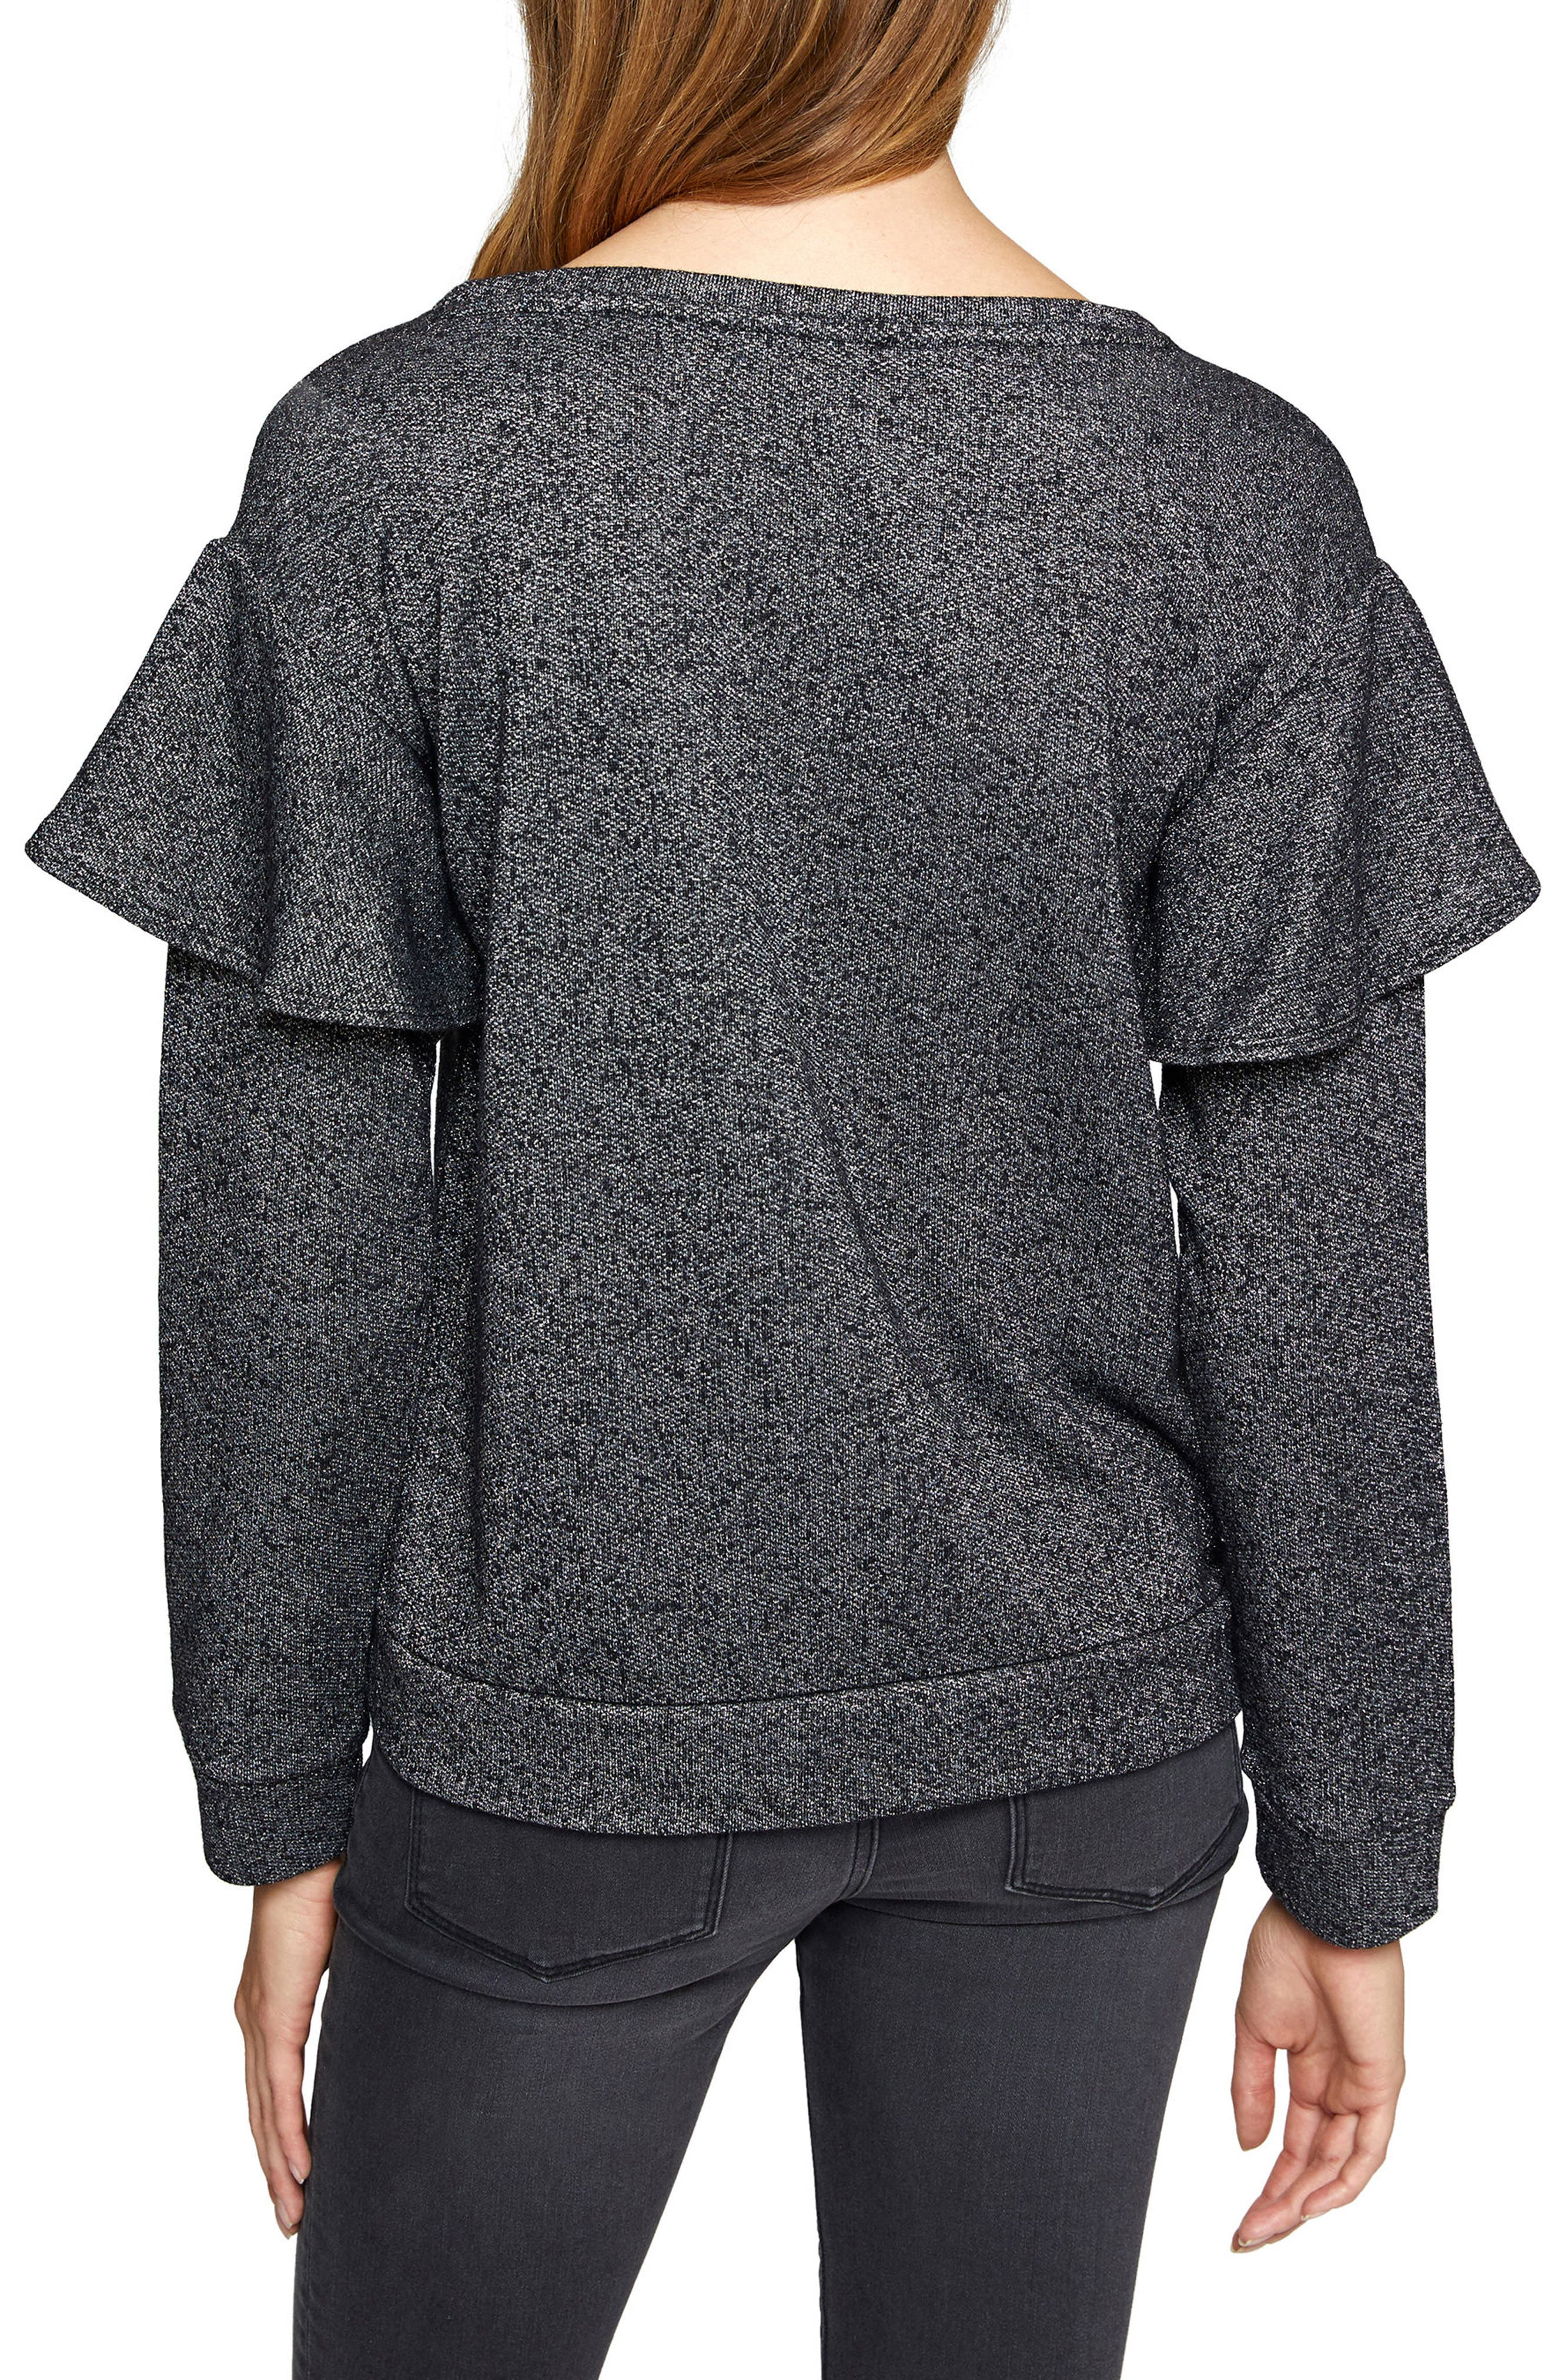 Dominique Metallic Sweatshirt,                             Alternate thumbnail 3, color,